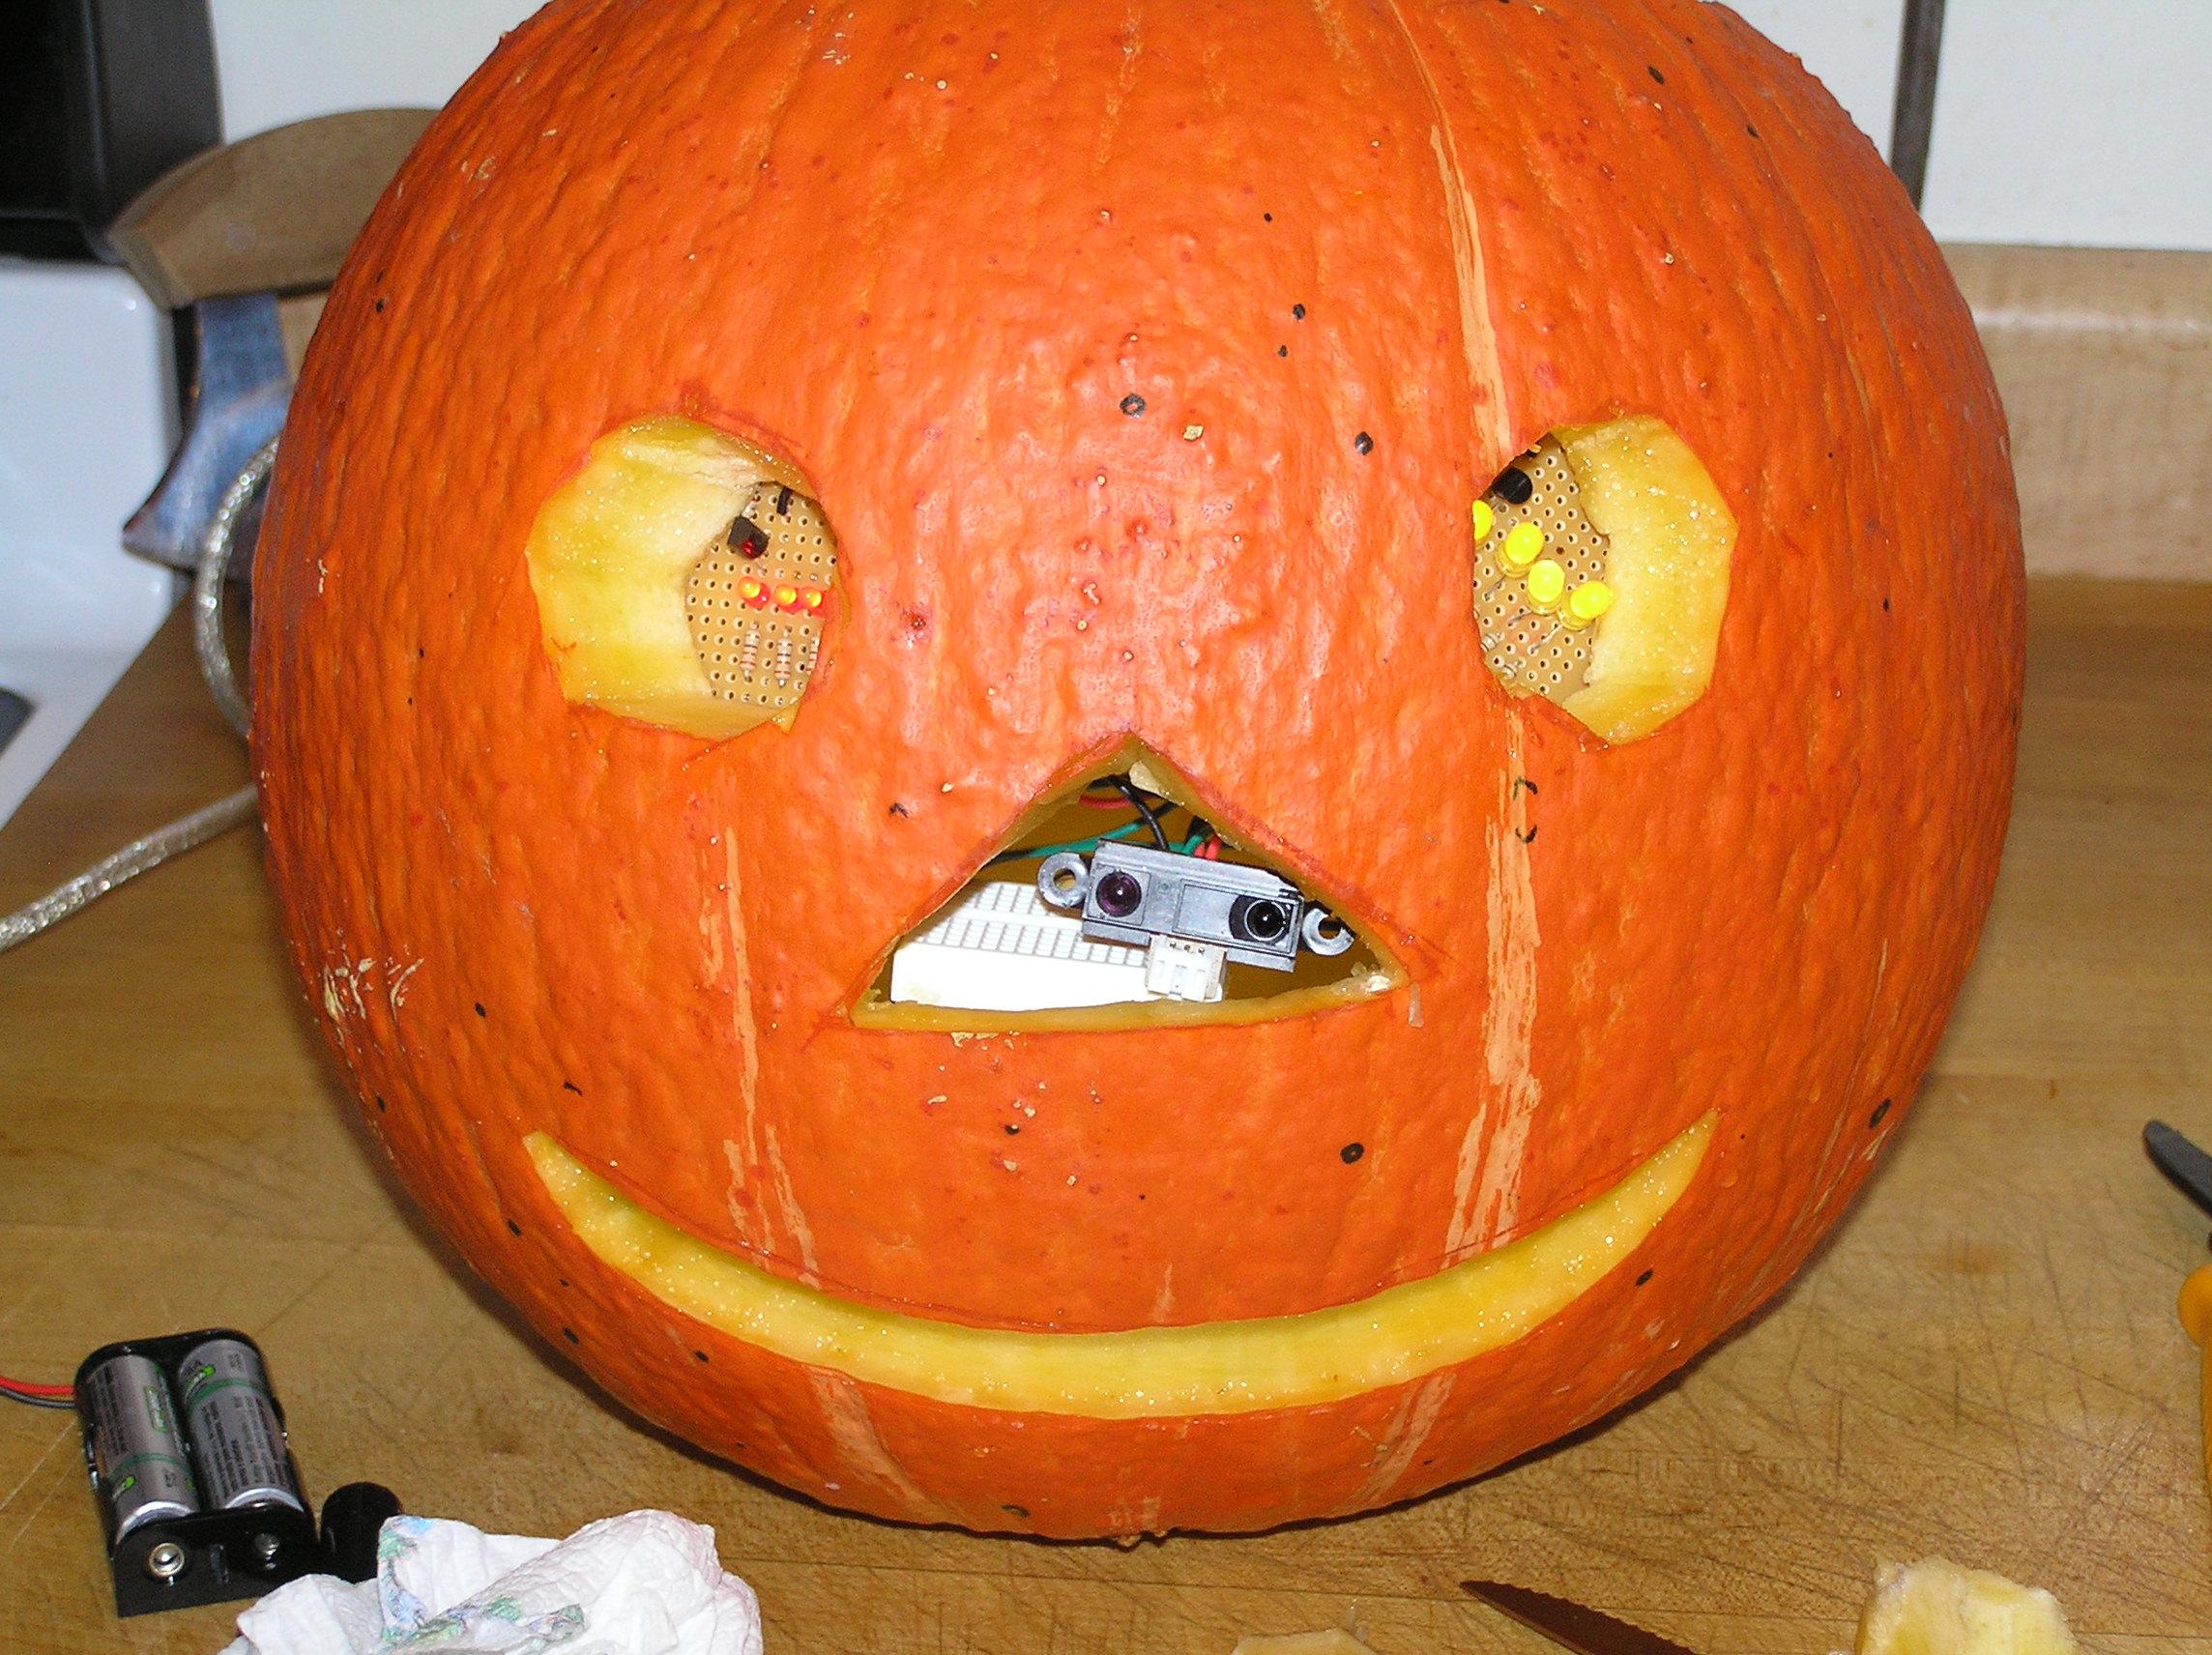 Picture of Arduino-Powered Pumpkin